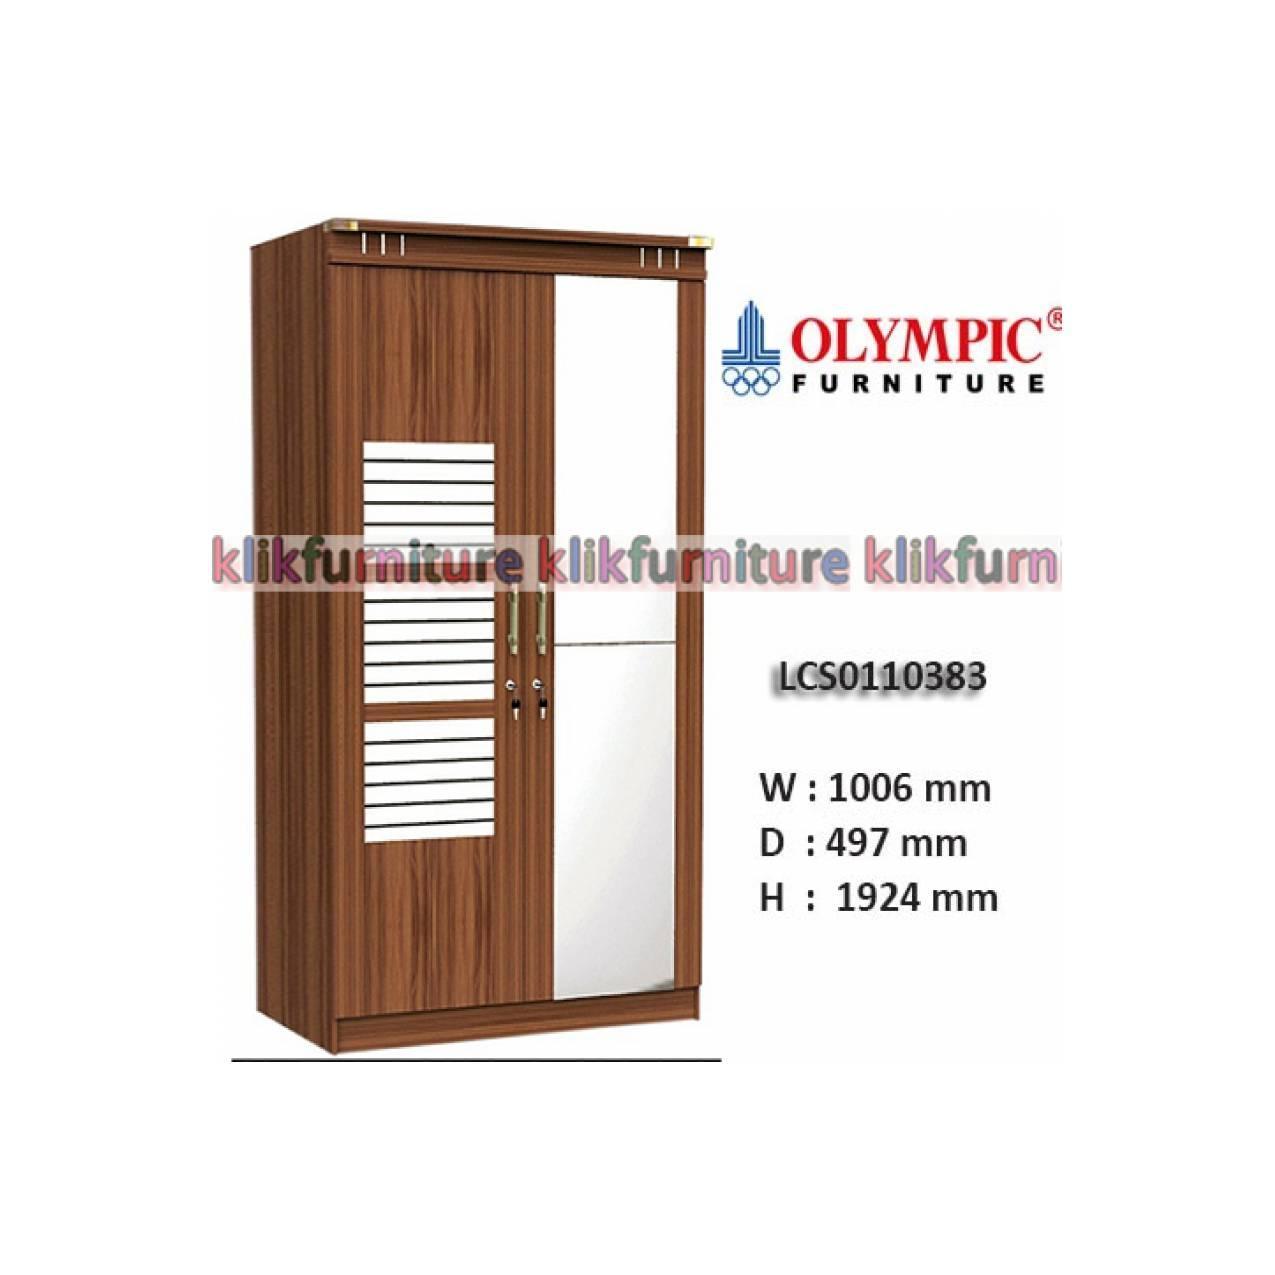 LCS0110383 VIANO Olympic Lemari 2 Pintu